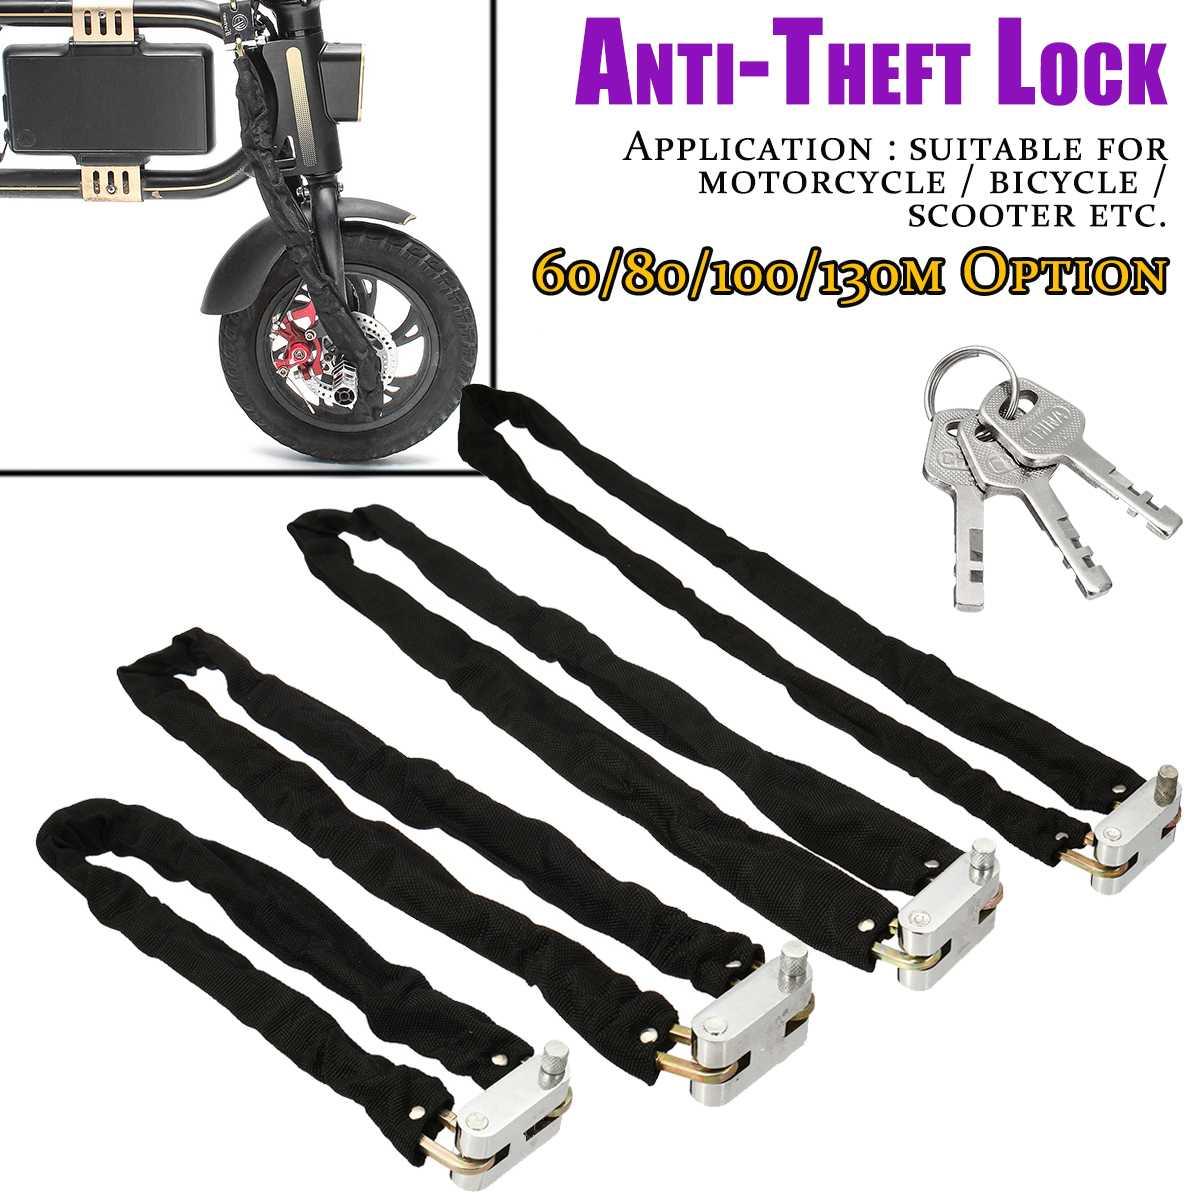 1.3m Bike Chain Lock Motorcycle Lock Heavy Duty Anti-Theft Metal Bicycle Padlock